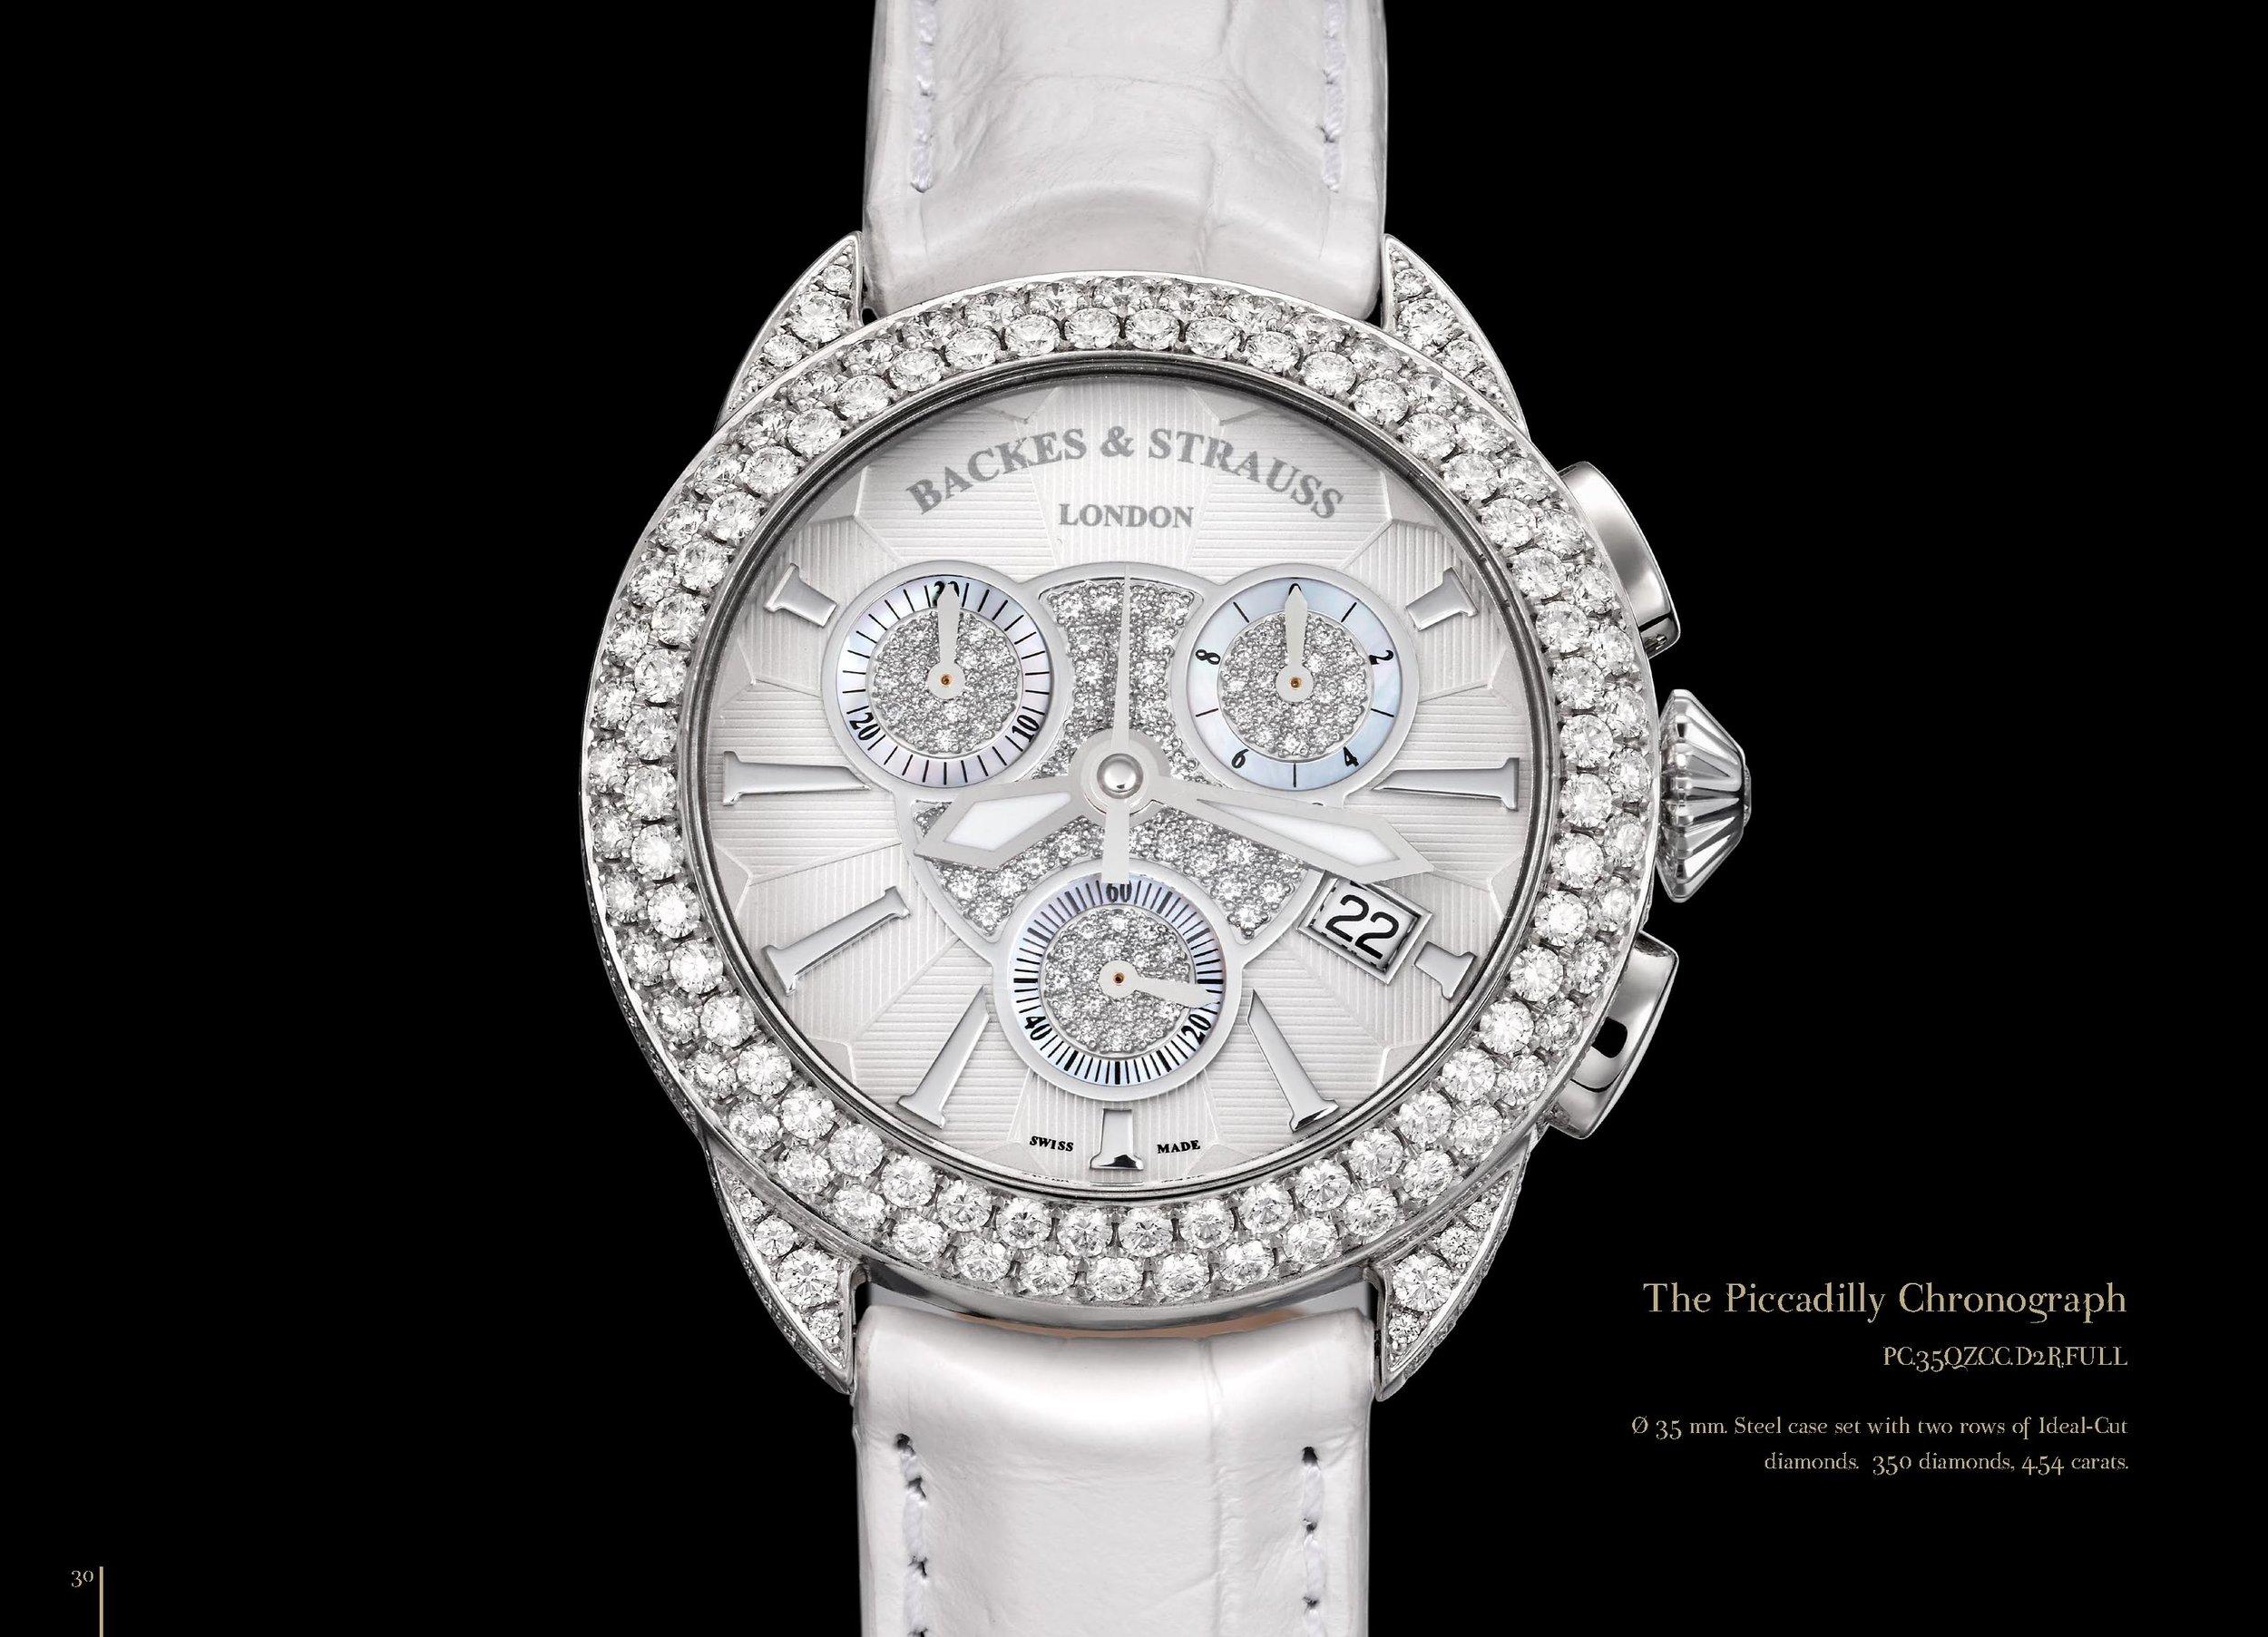 Piccadilly Chronograph 35 diamond watch